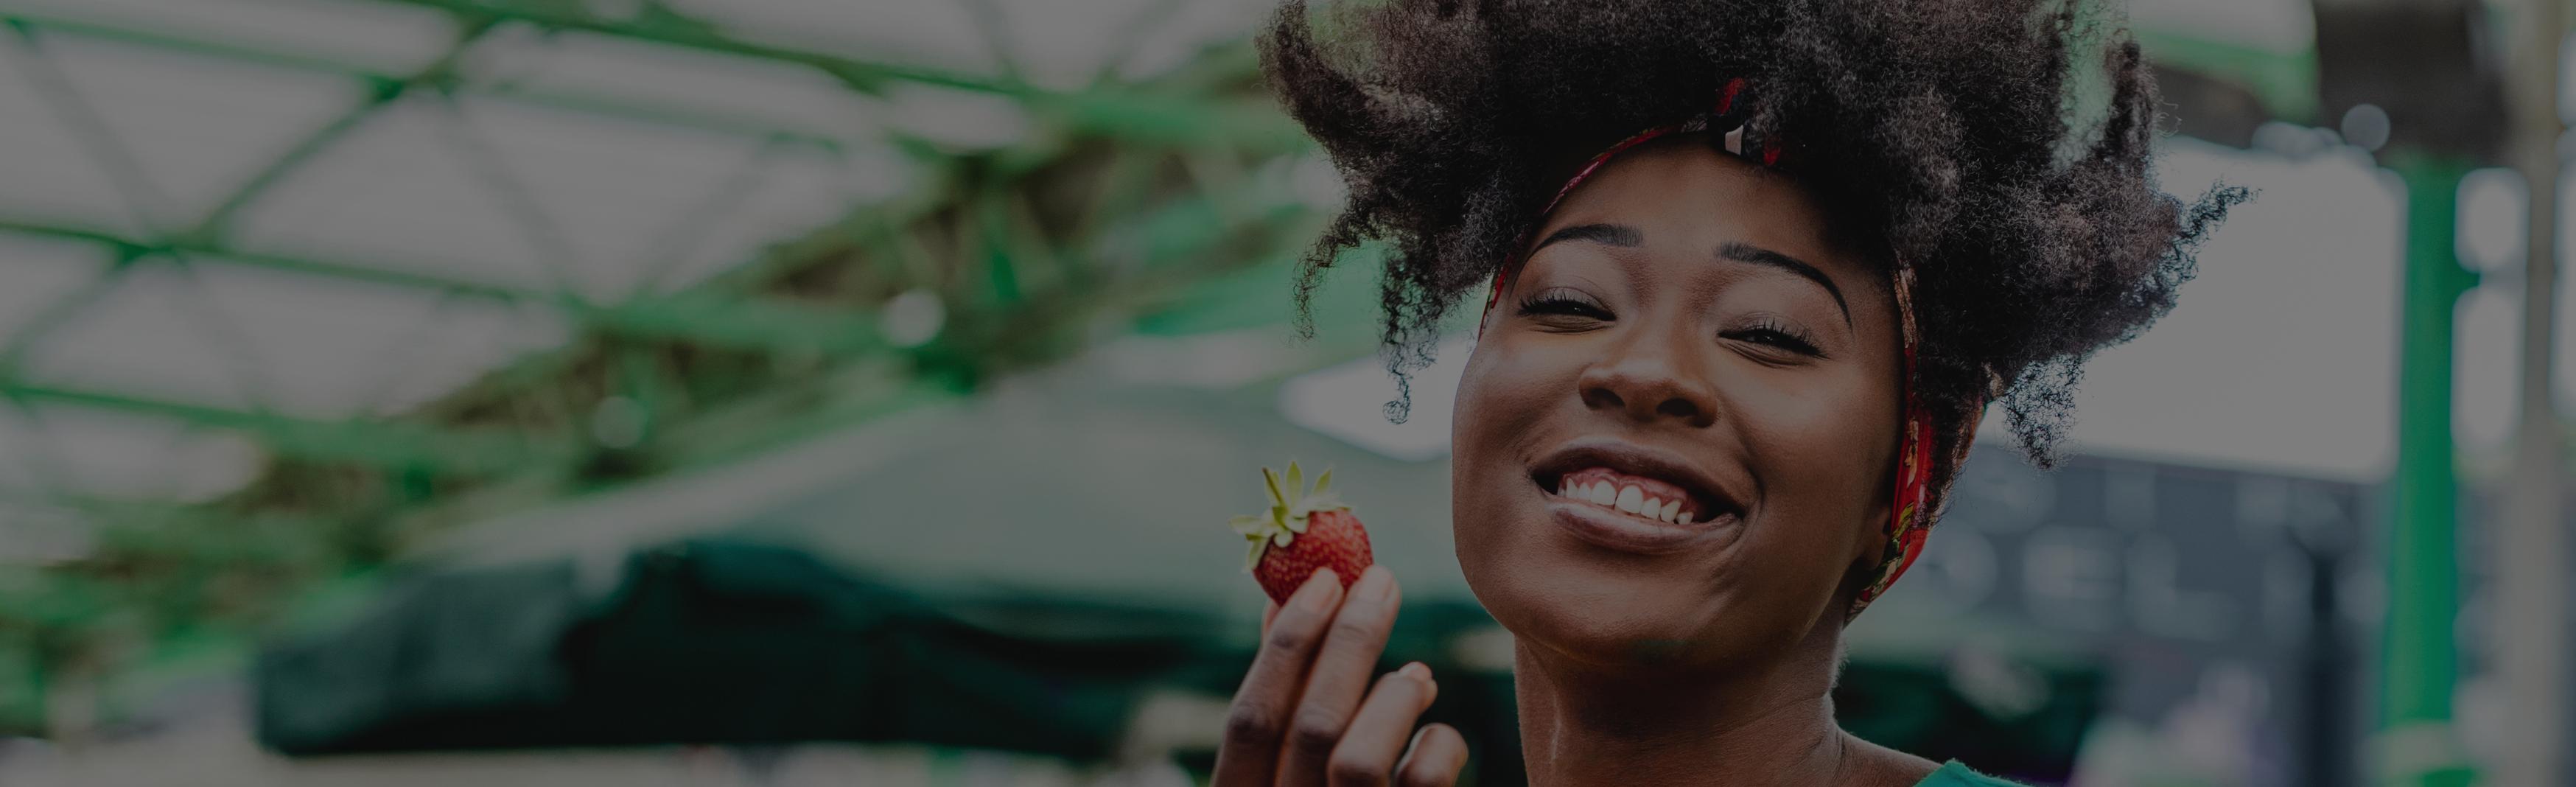 LP_Header-1748x534-grey-african-american-woman-eating-fruit-nutrition-healthy